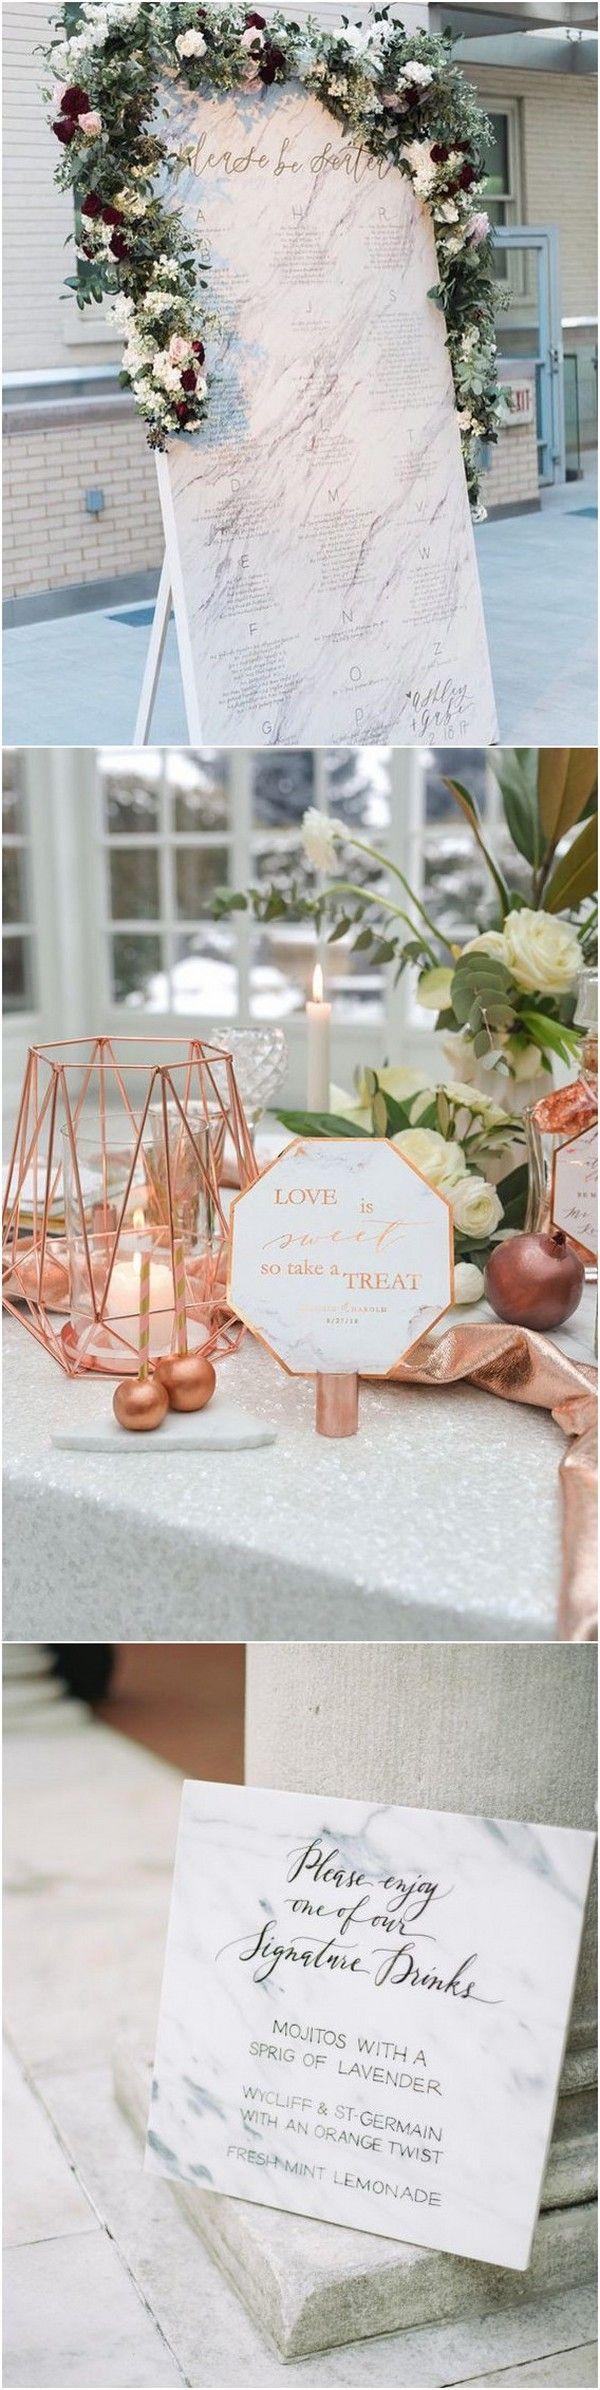 74 best Wedding Signs images on Pinterest | Chalkboard wedding signs ...